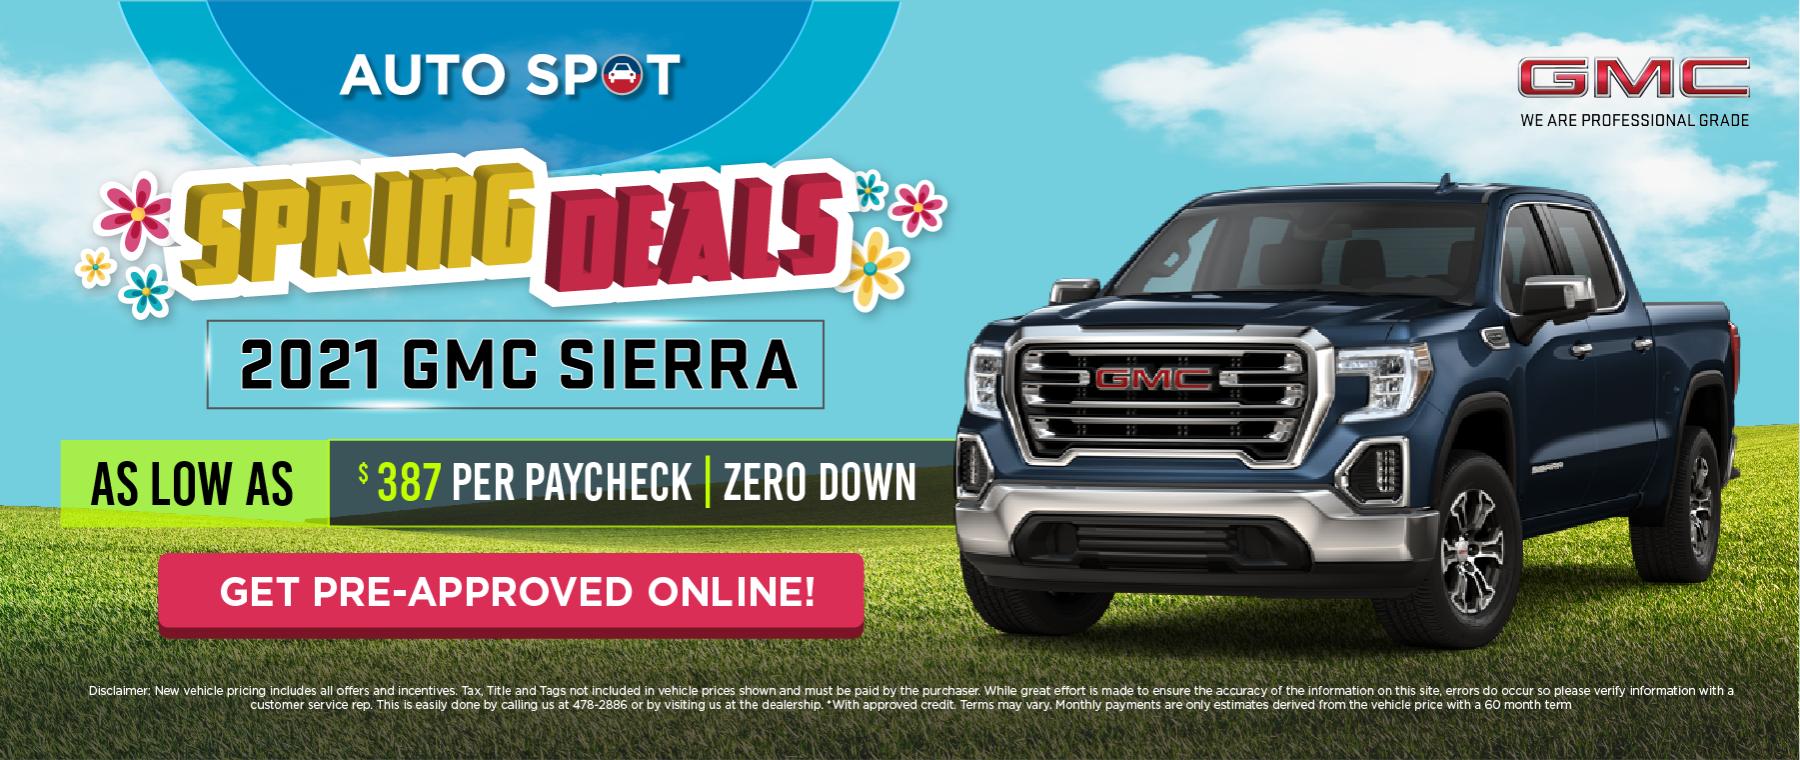 GMC Spring Ads_Web Banner